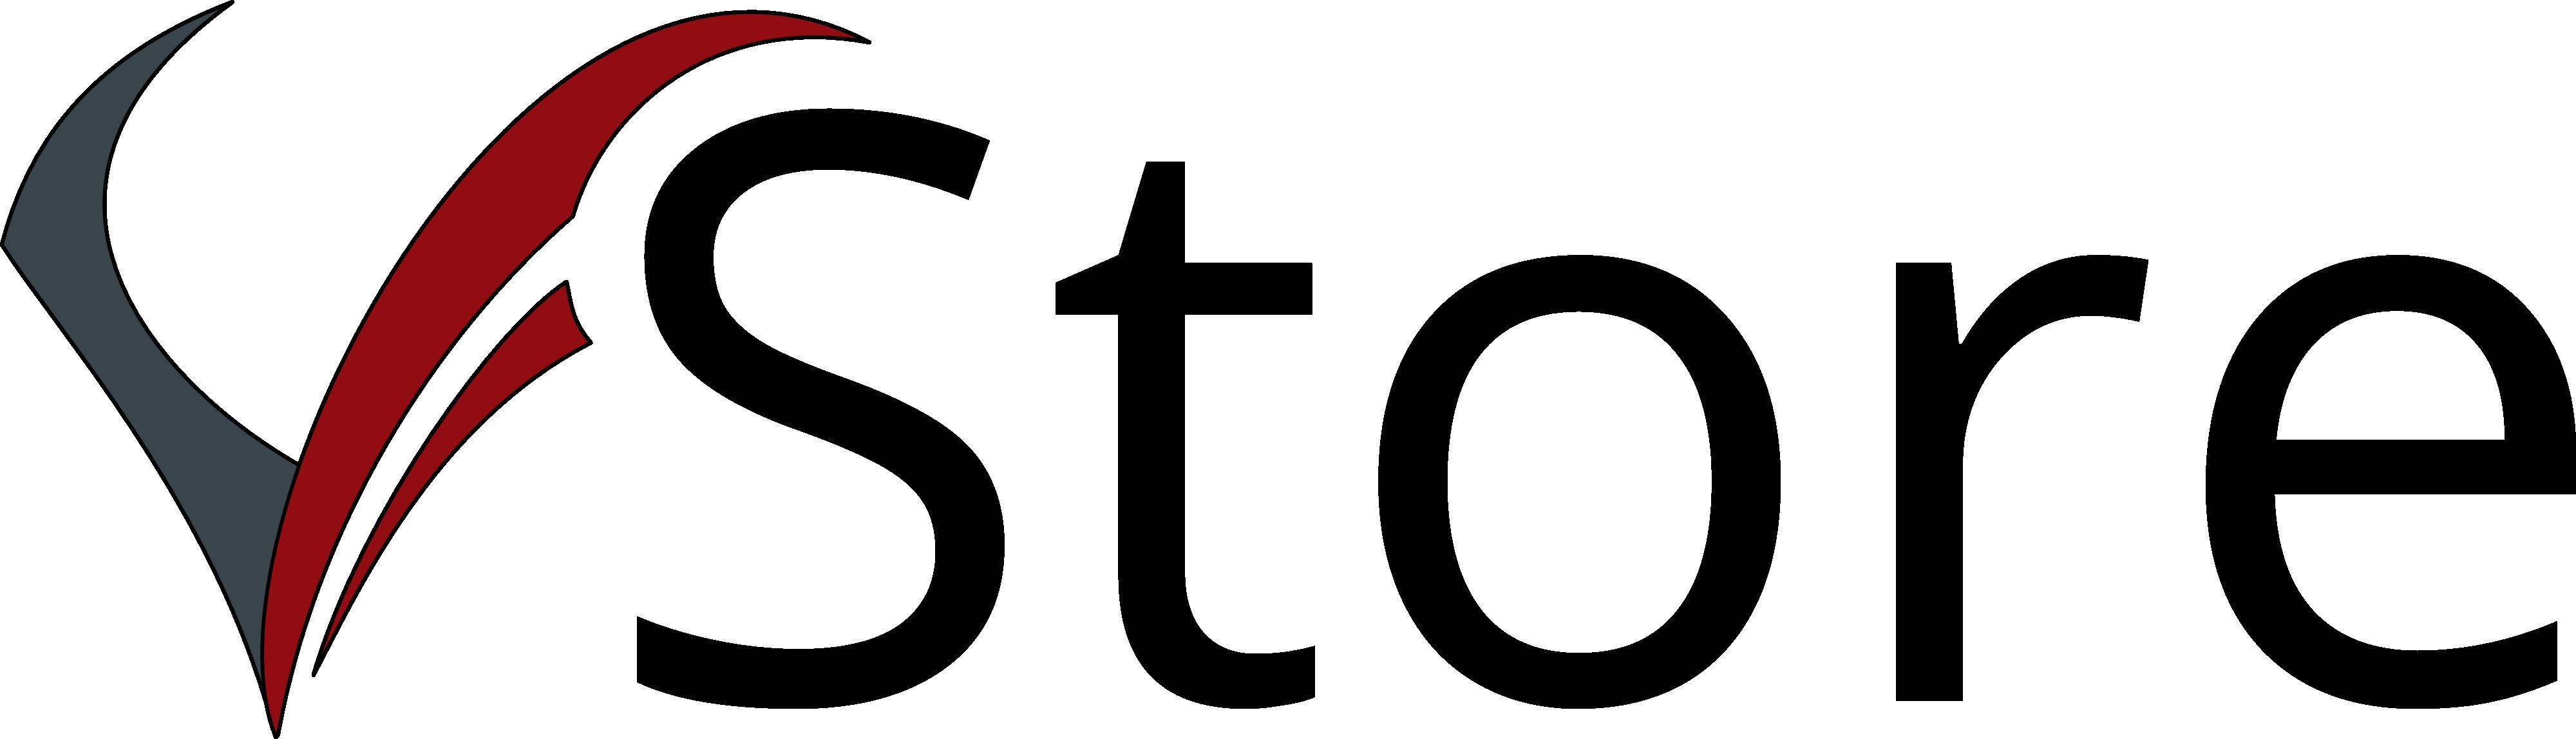 VStore logo